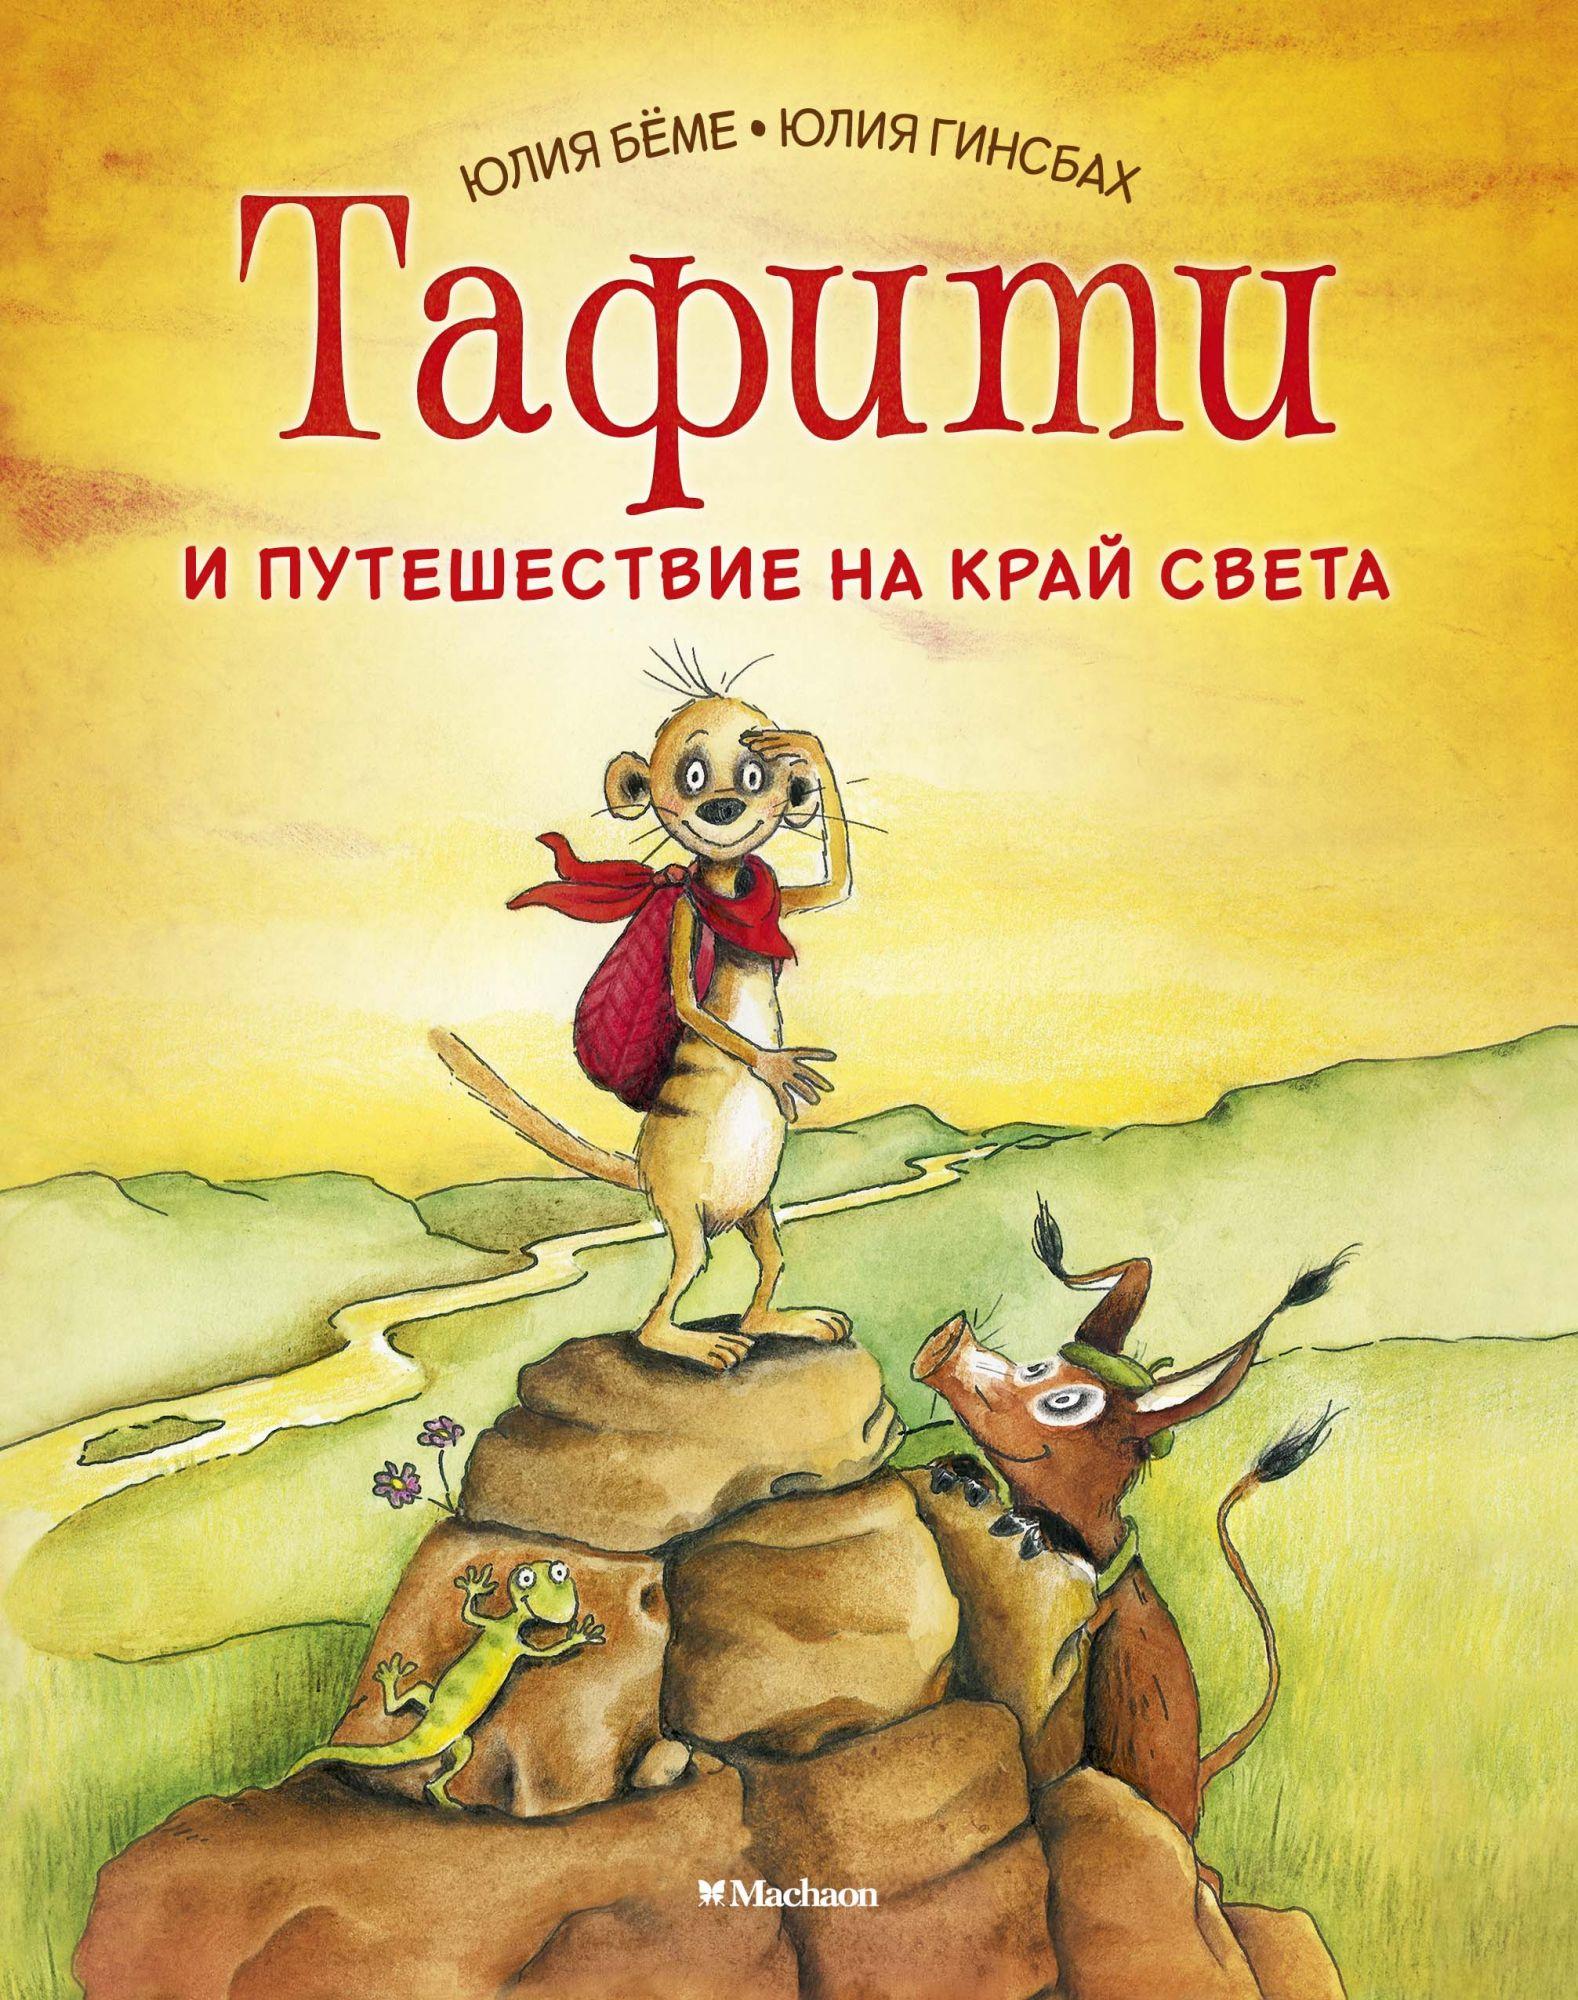 http://chelib.ru/wp-content/uploads/img/books/beme-ginsbah-tafiti.jpg